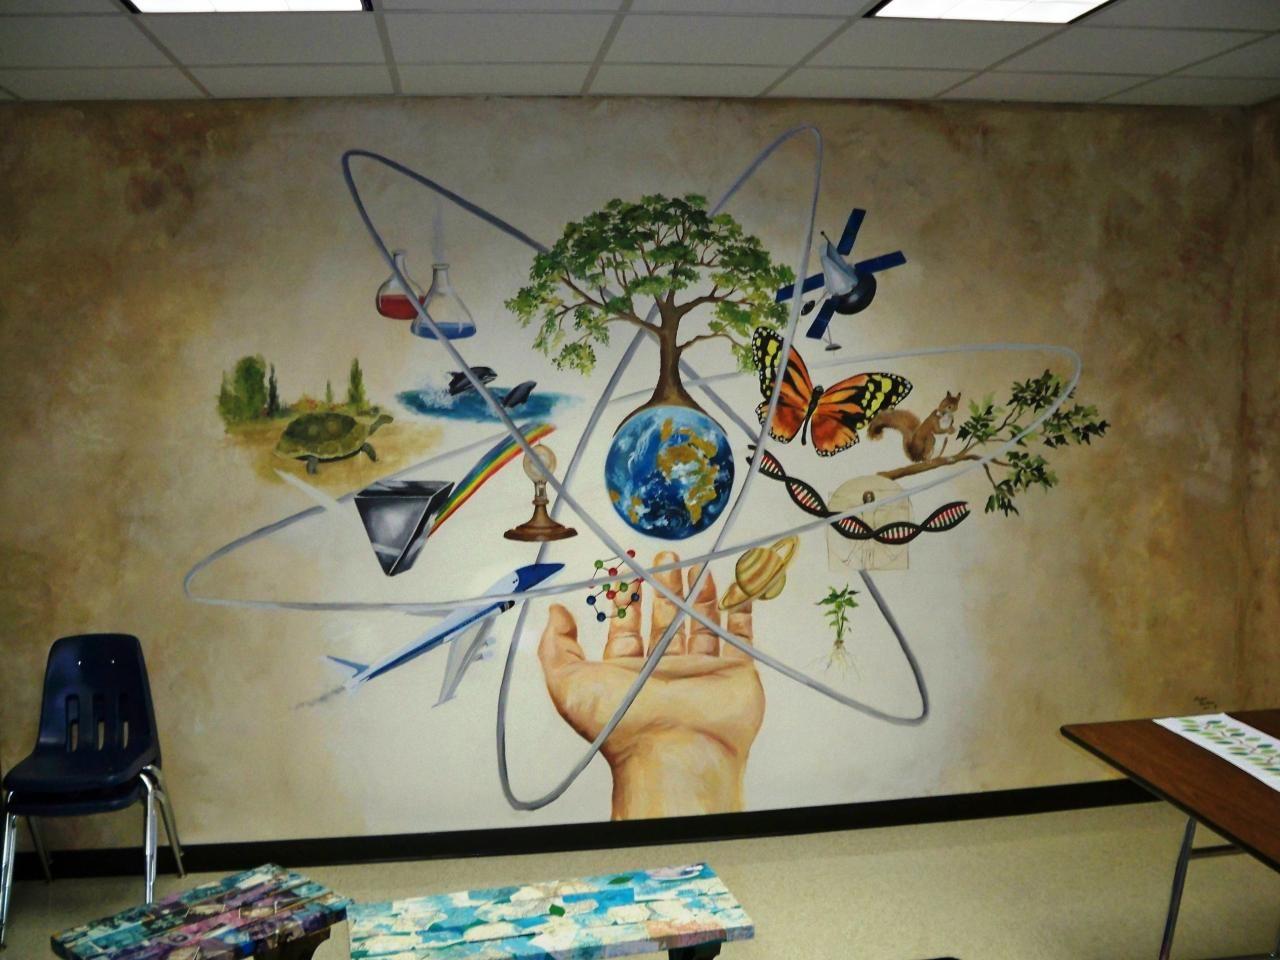 Classroom Mural Design : The world in their hands map wall art mural ideas